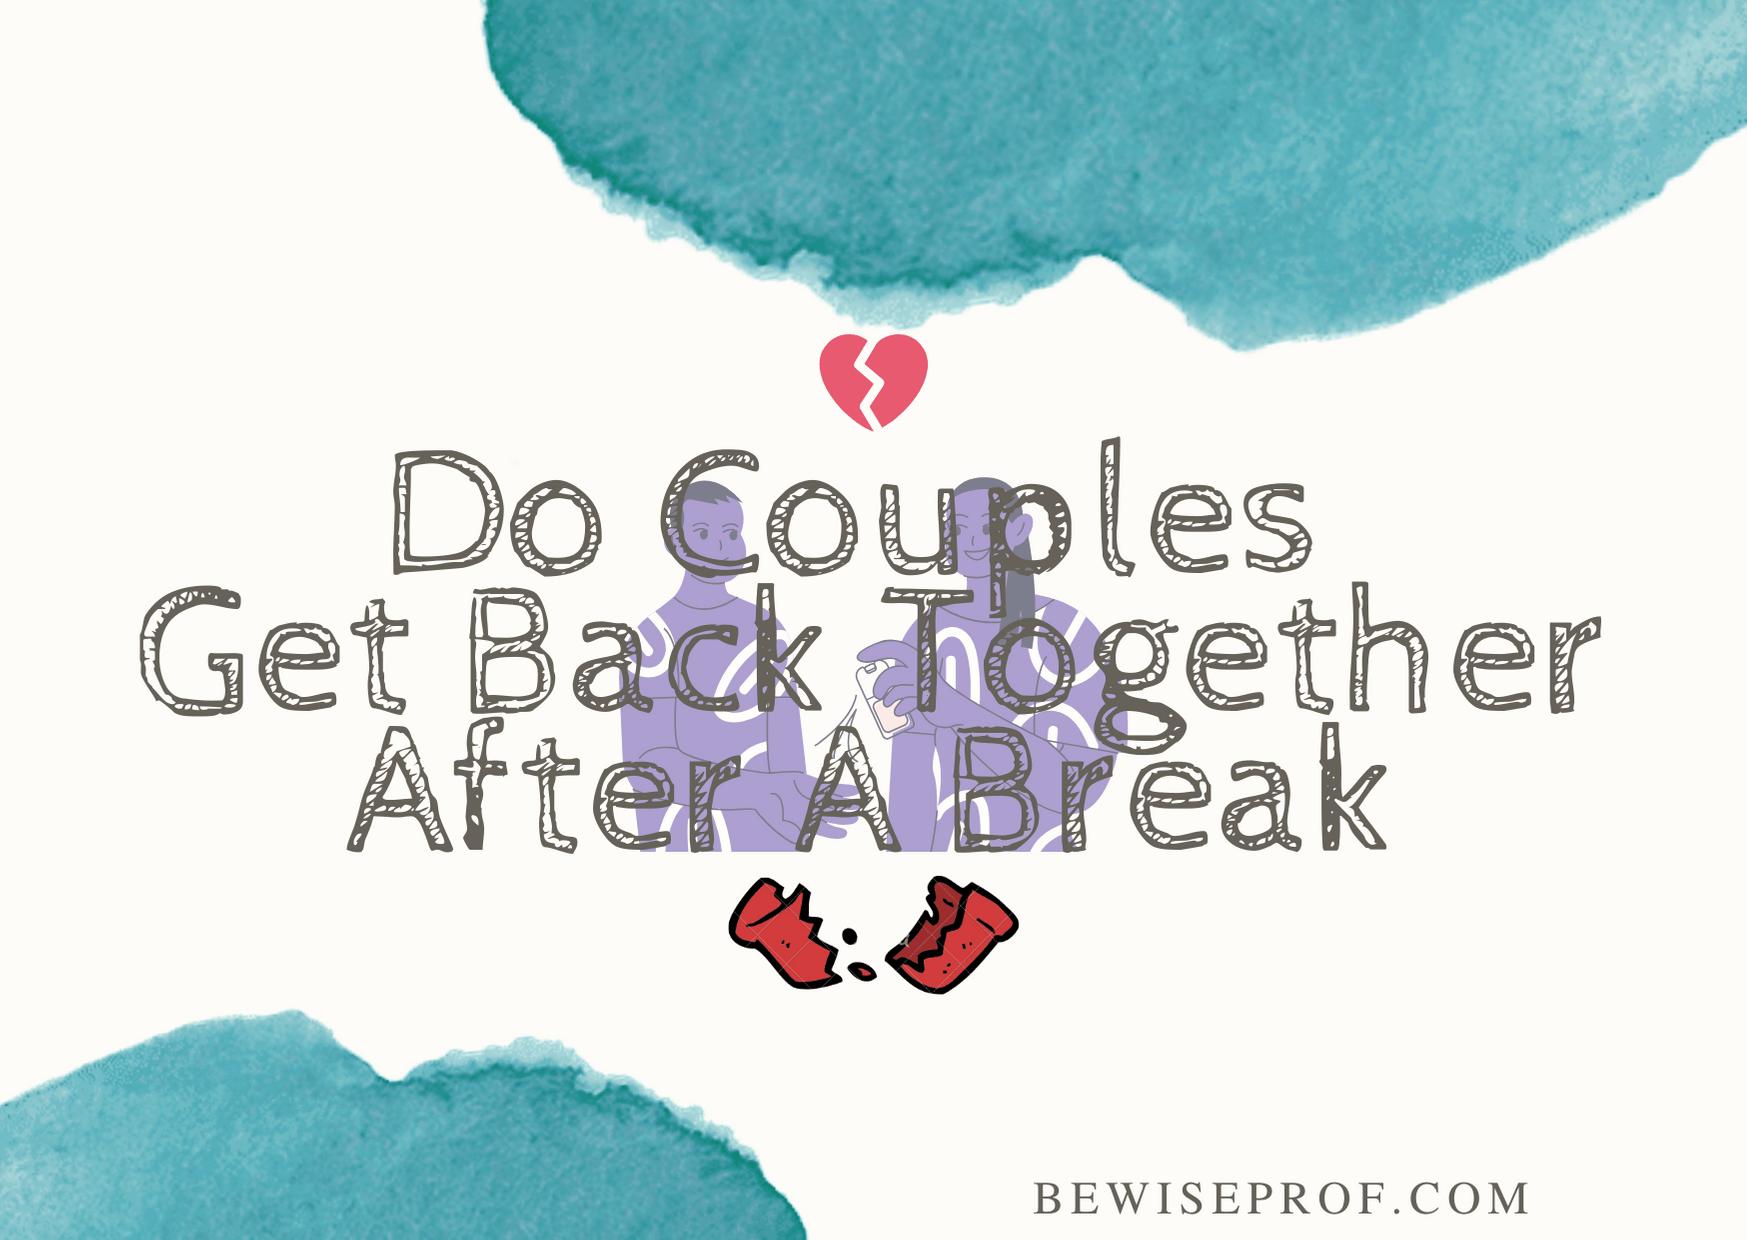 Will we get back together after a break